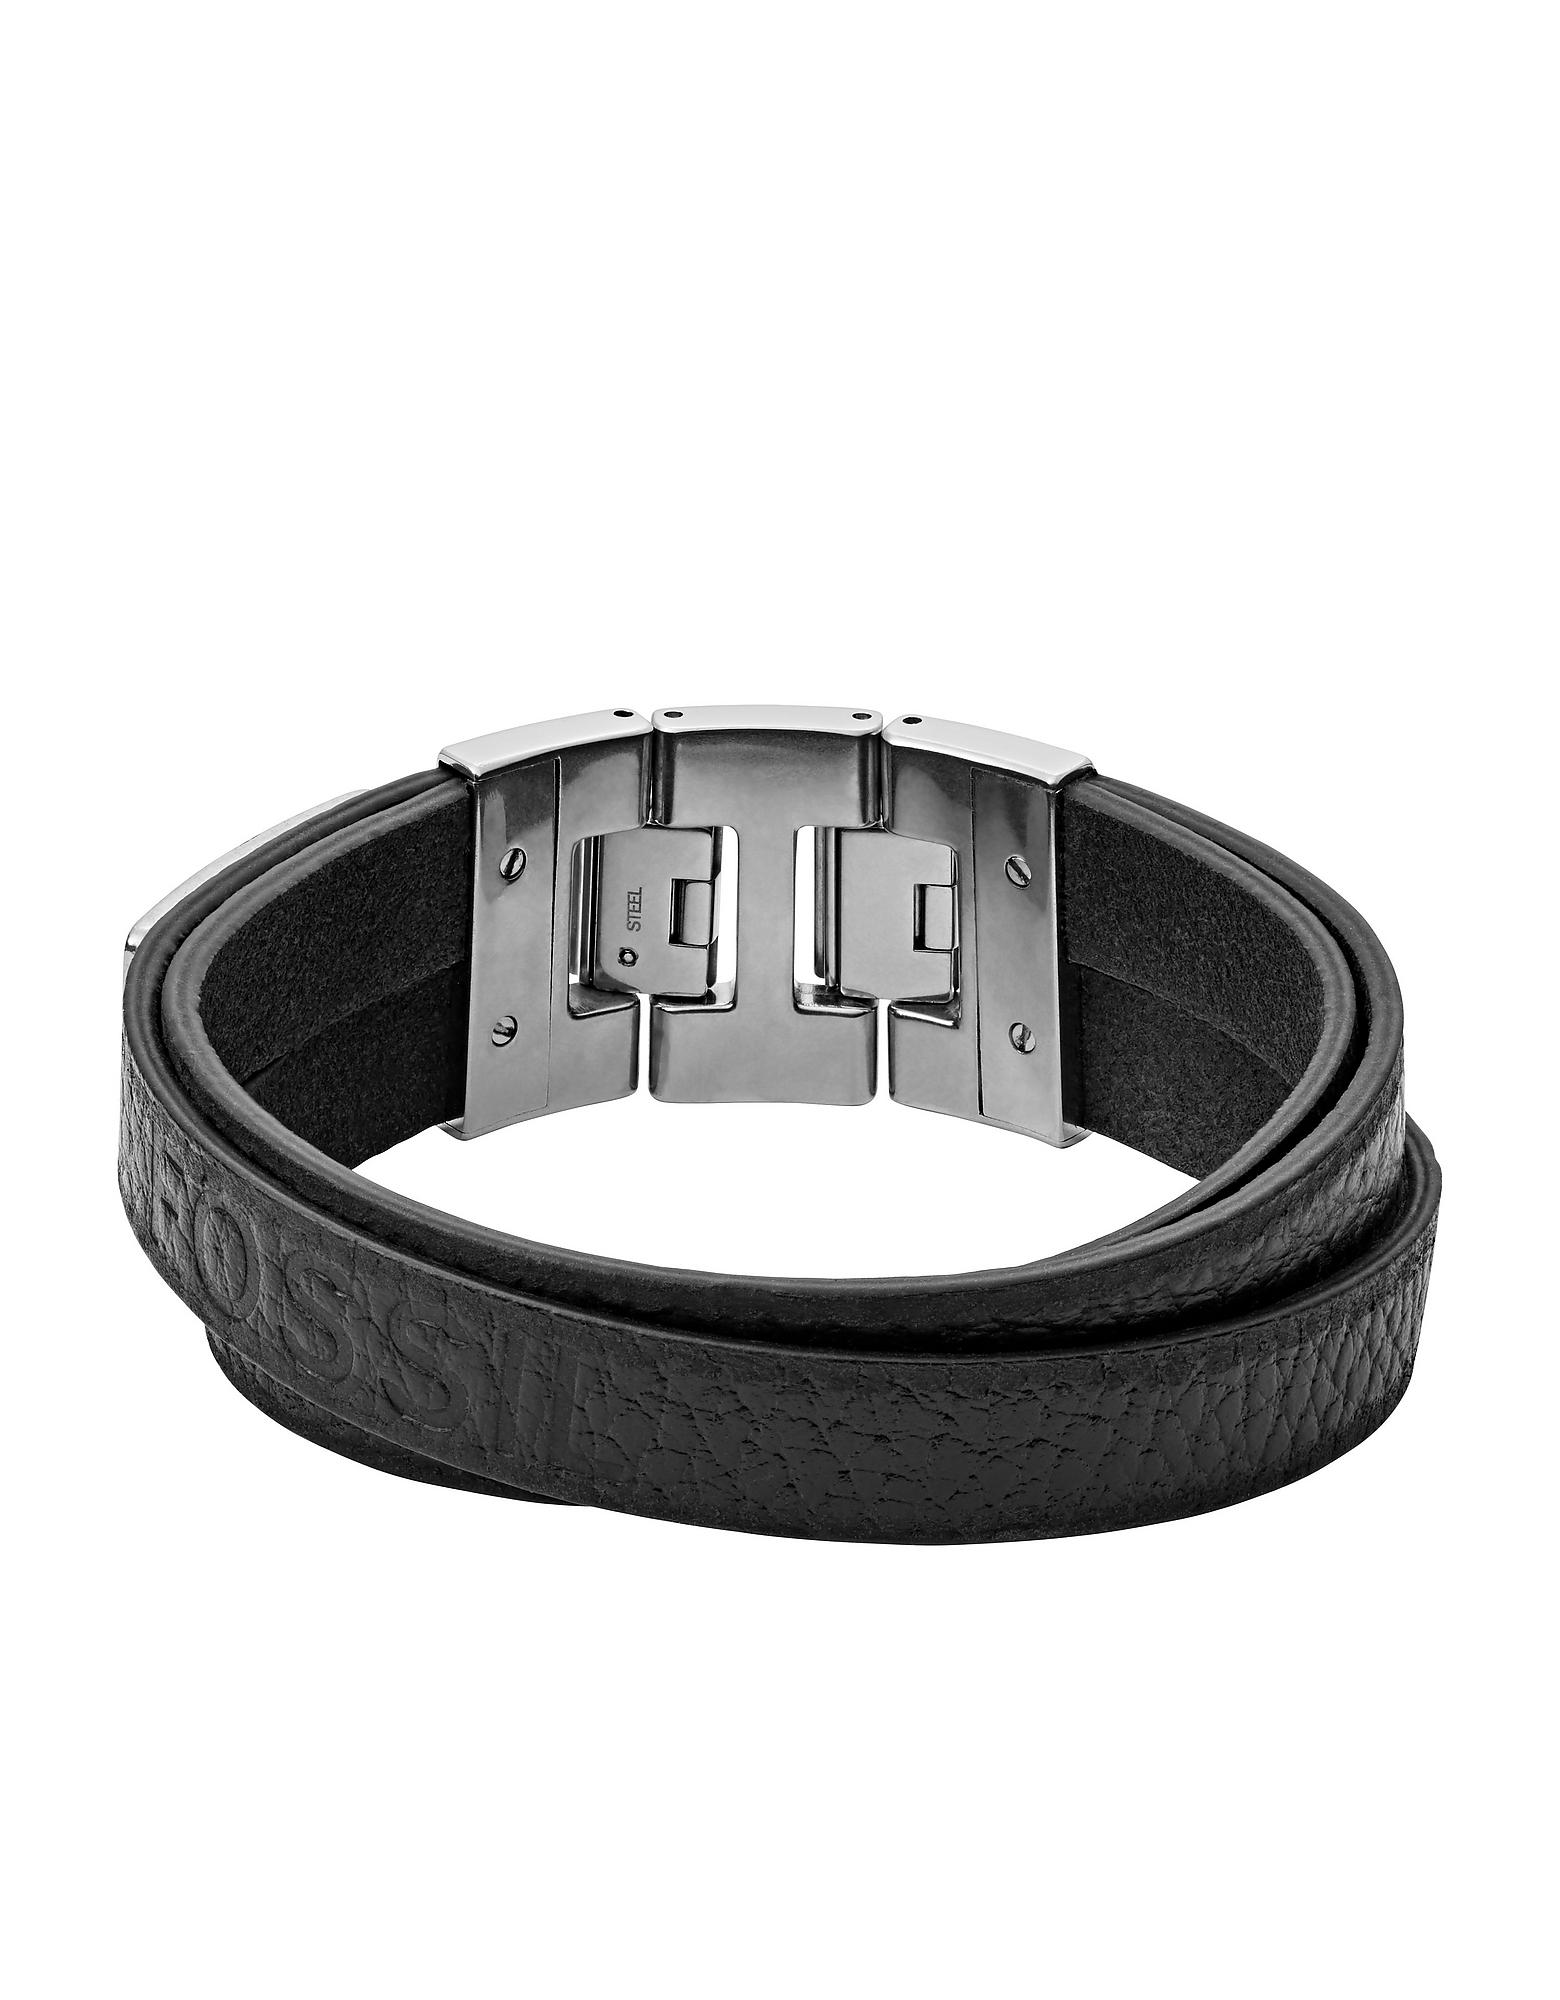 Black Double Men's Bracelet